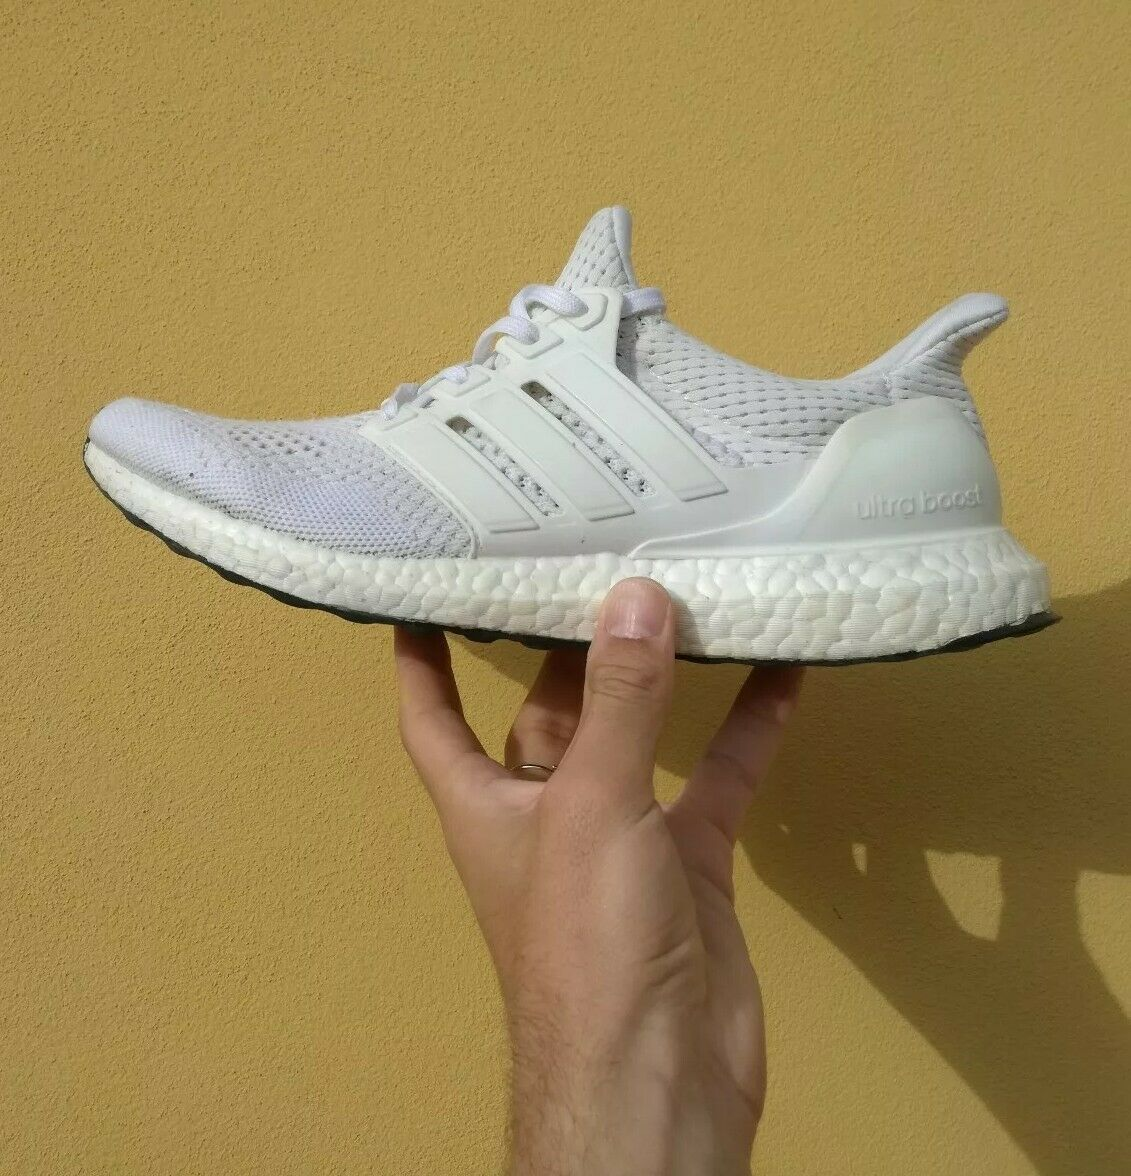 Adidas Ultra boost 1.0 paniers